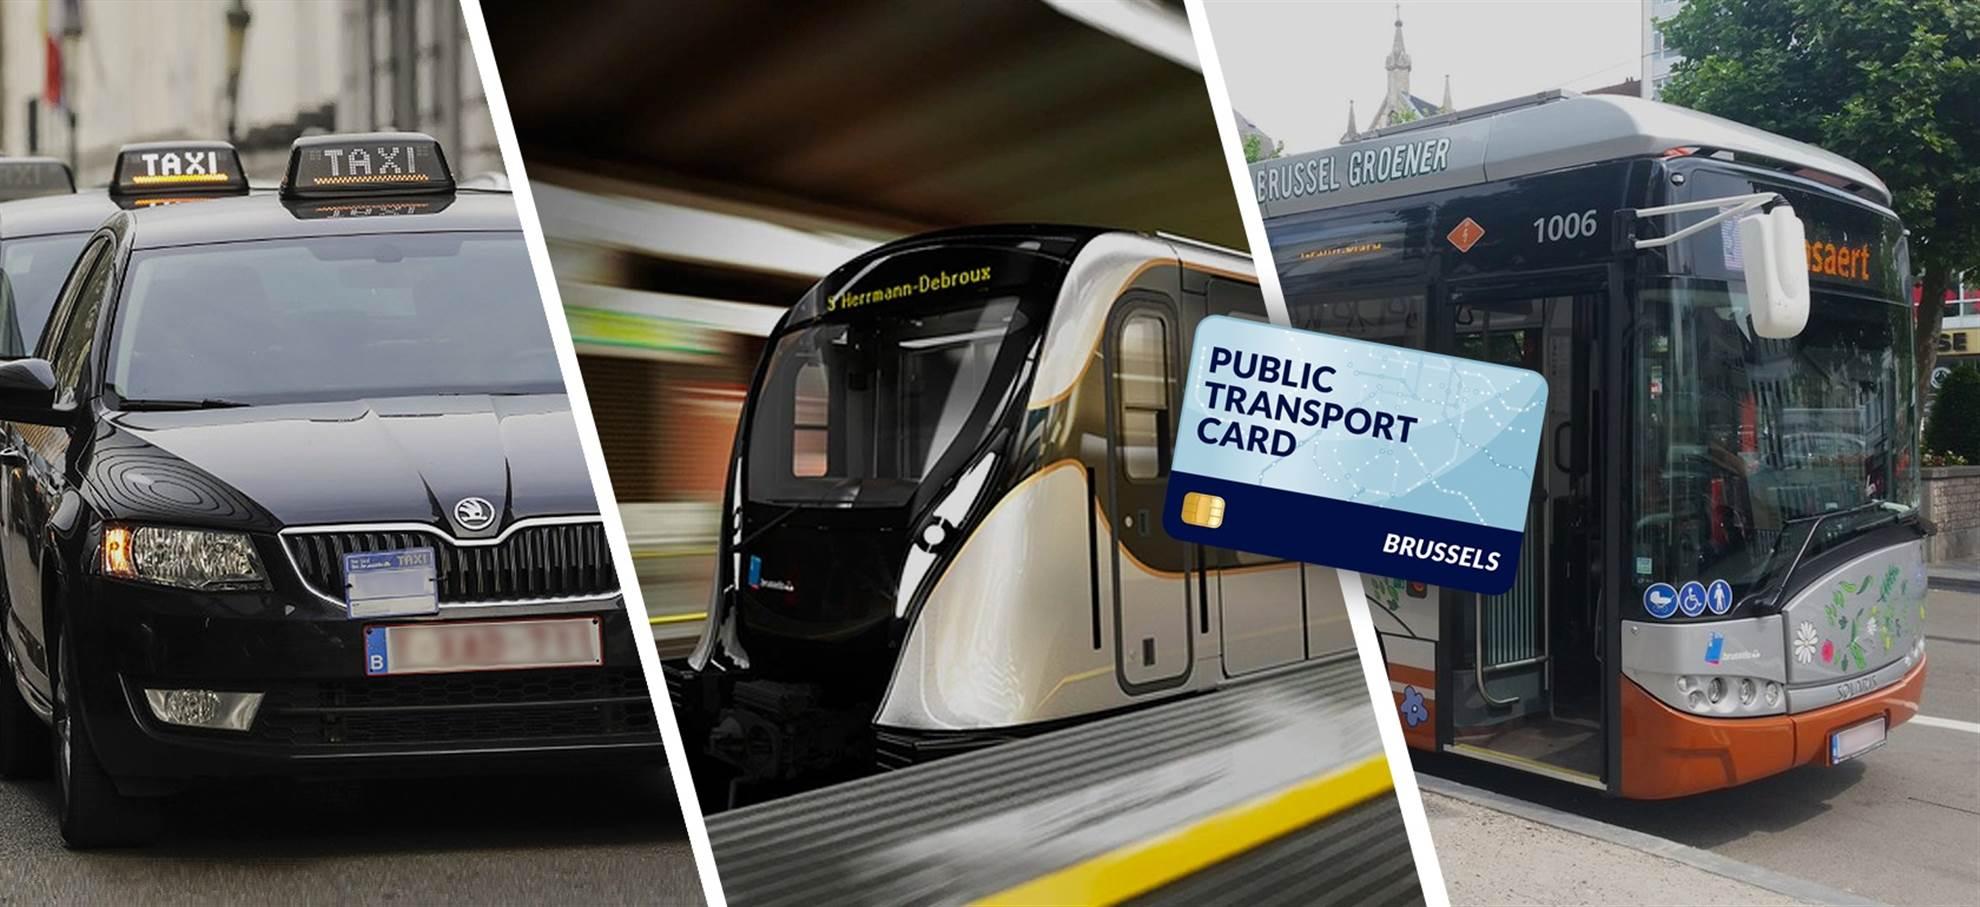 Bruxelles Travel Card